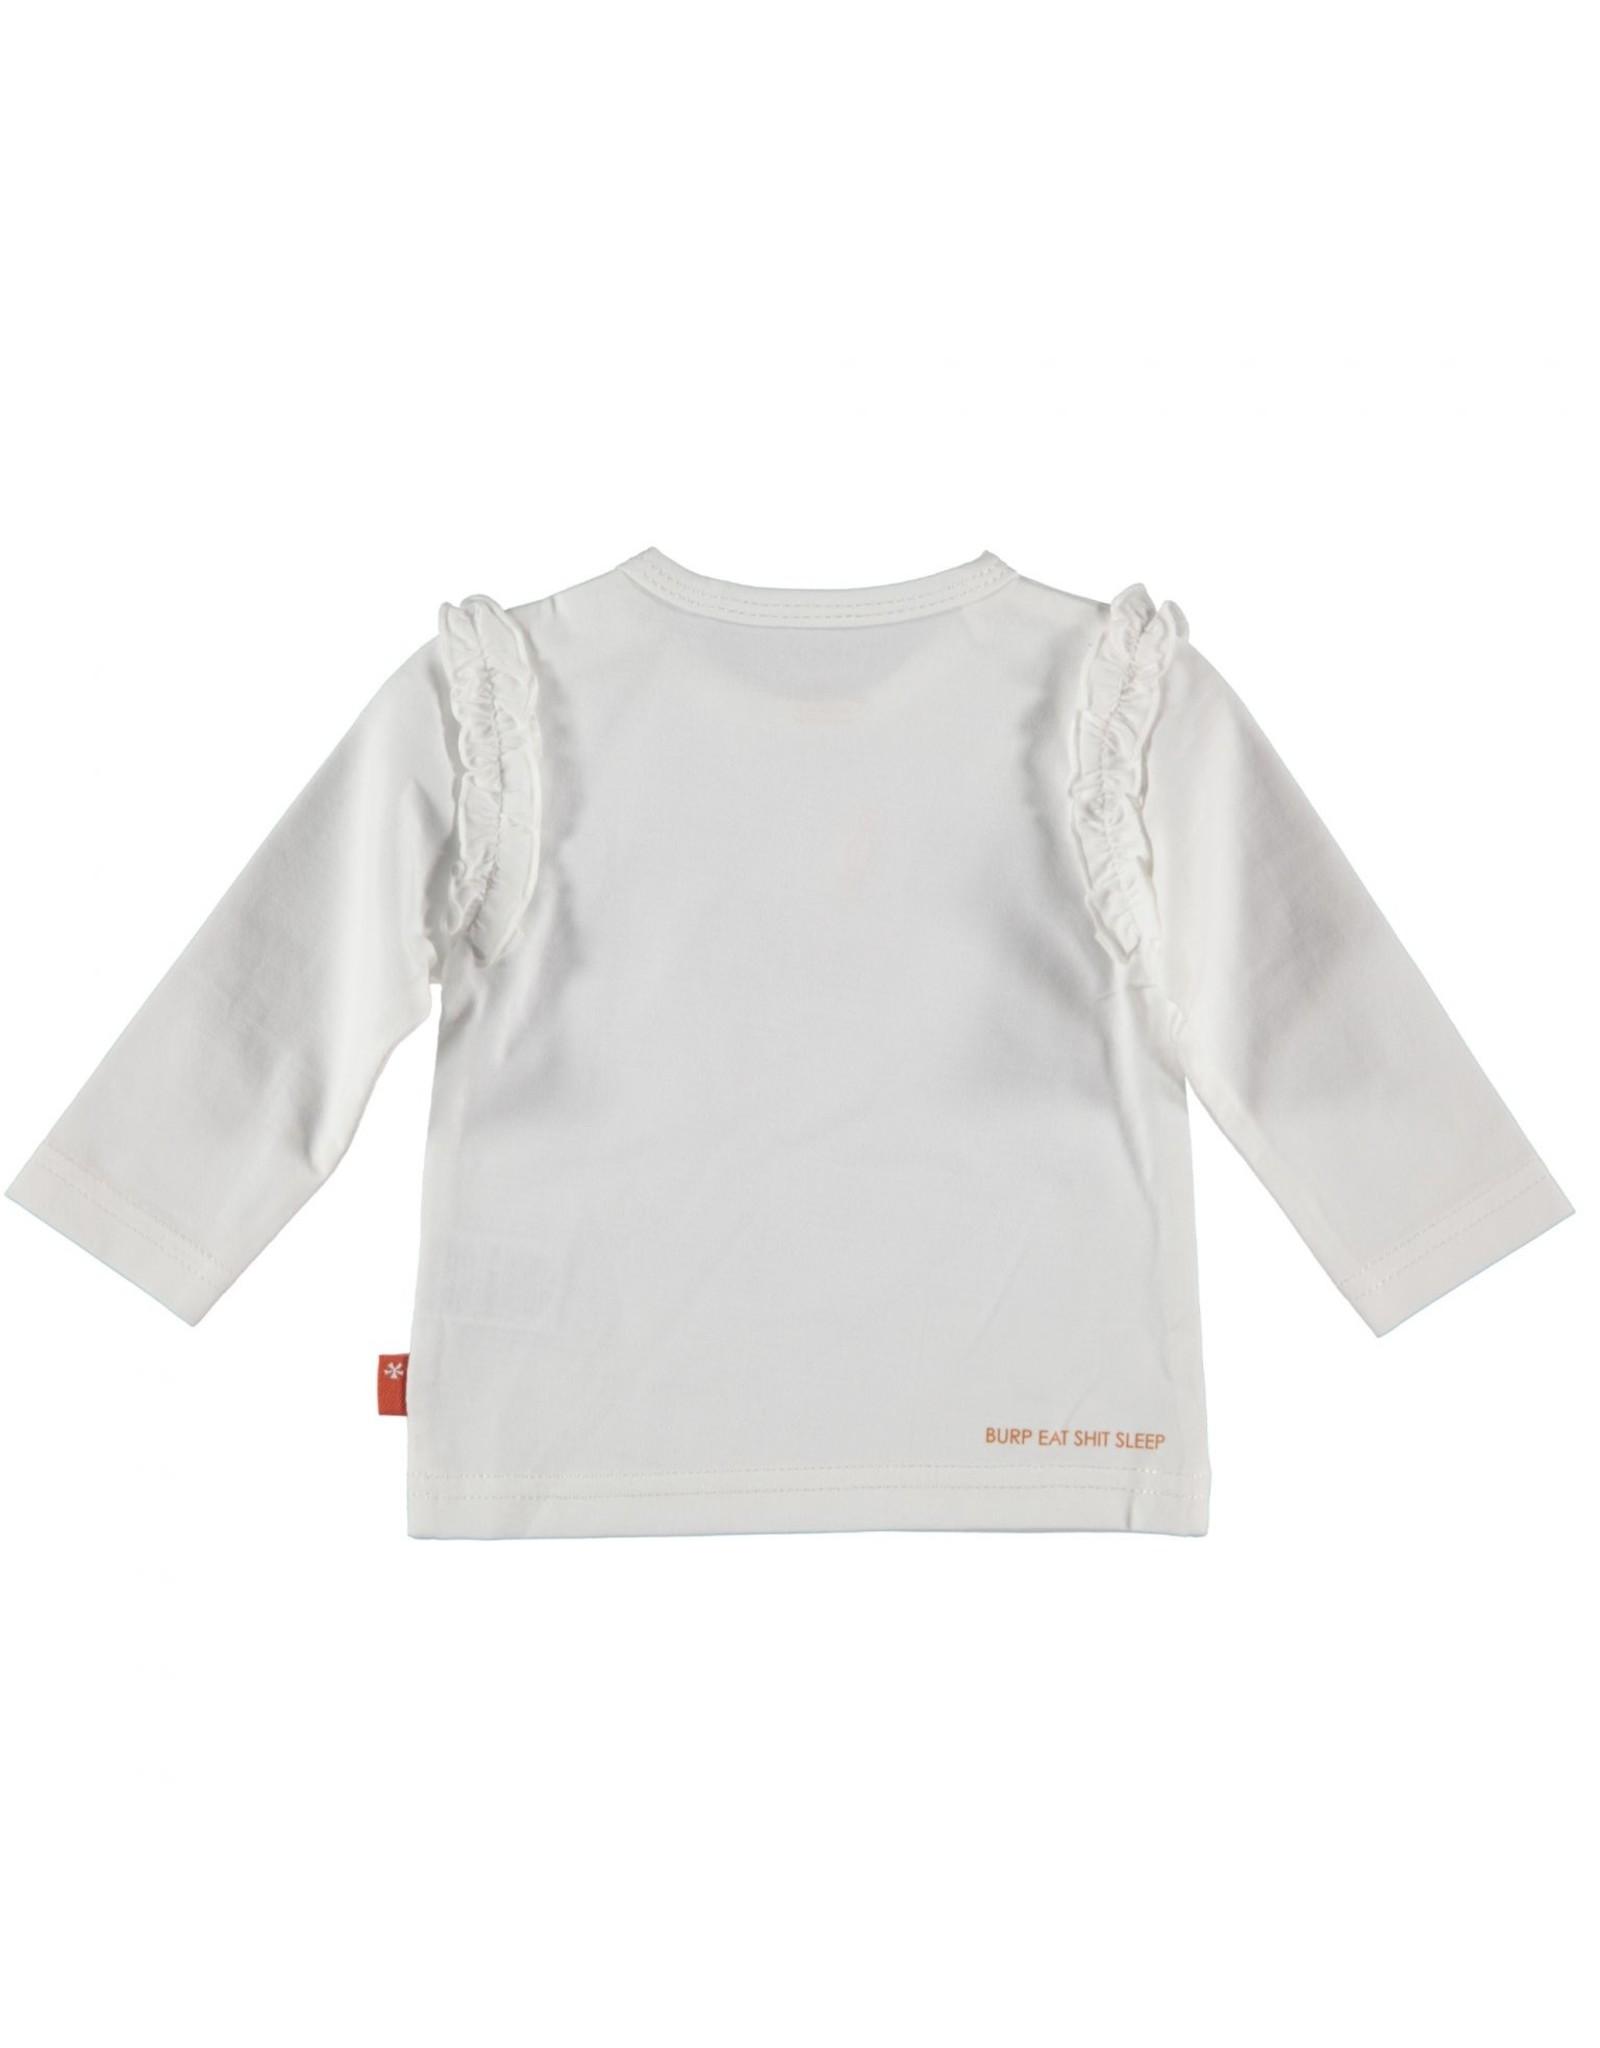 BESS Bess Shirt L. Sl. Zebra Ruffles White